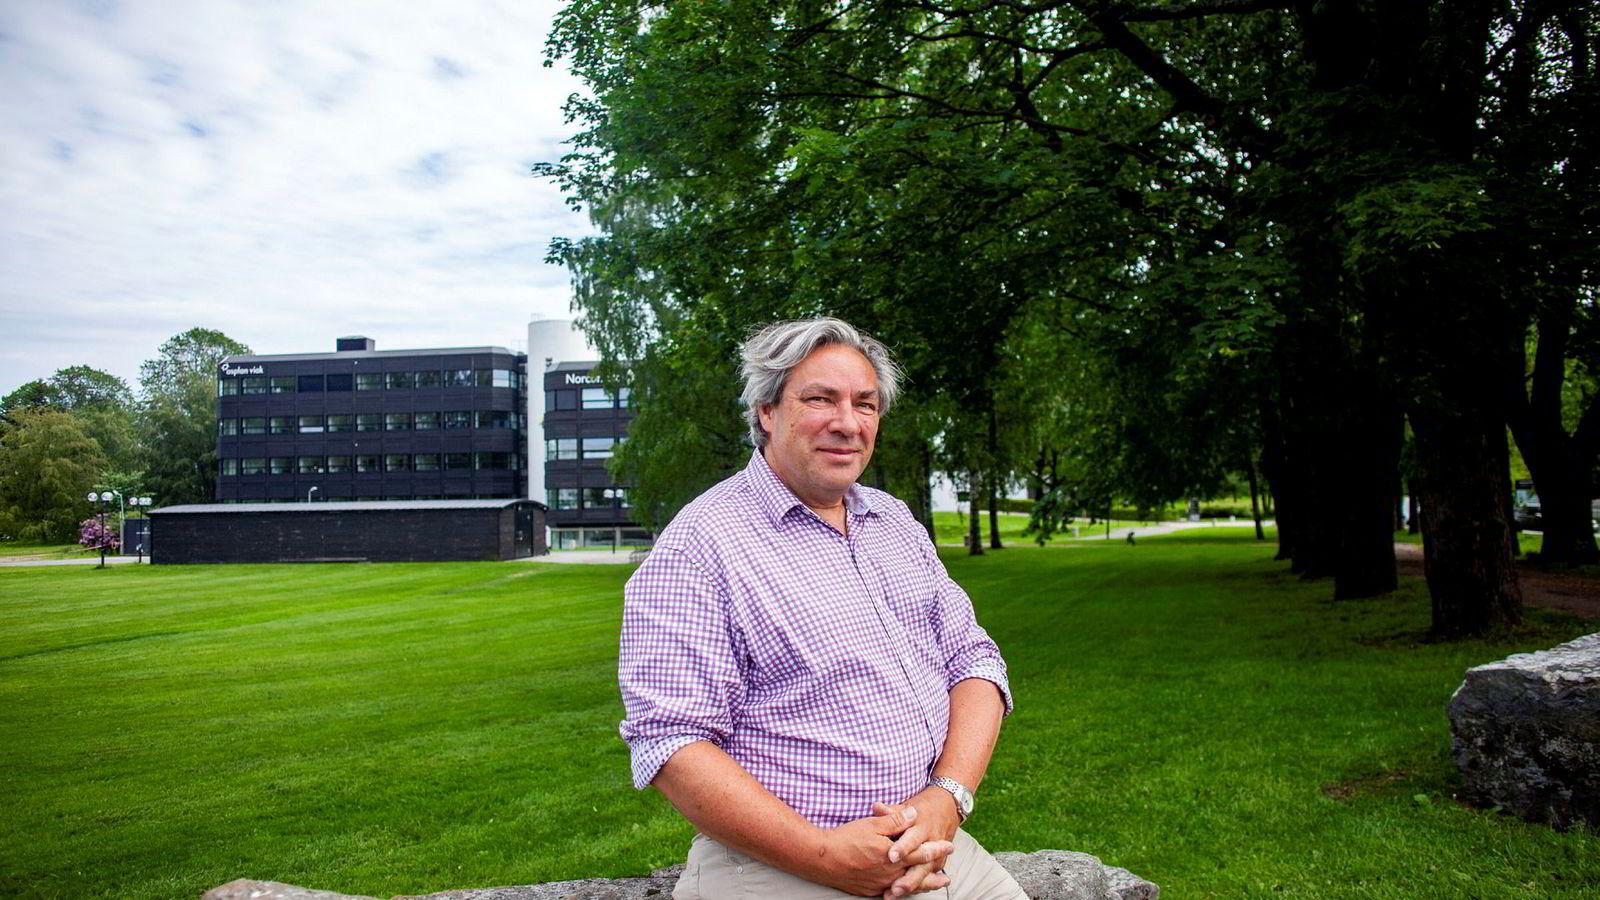 Leder Ulf Hafseld i Norsk Hydrogenbilforening (HYBIL).